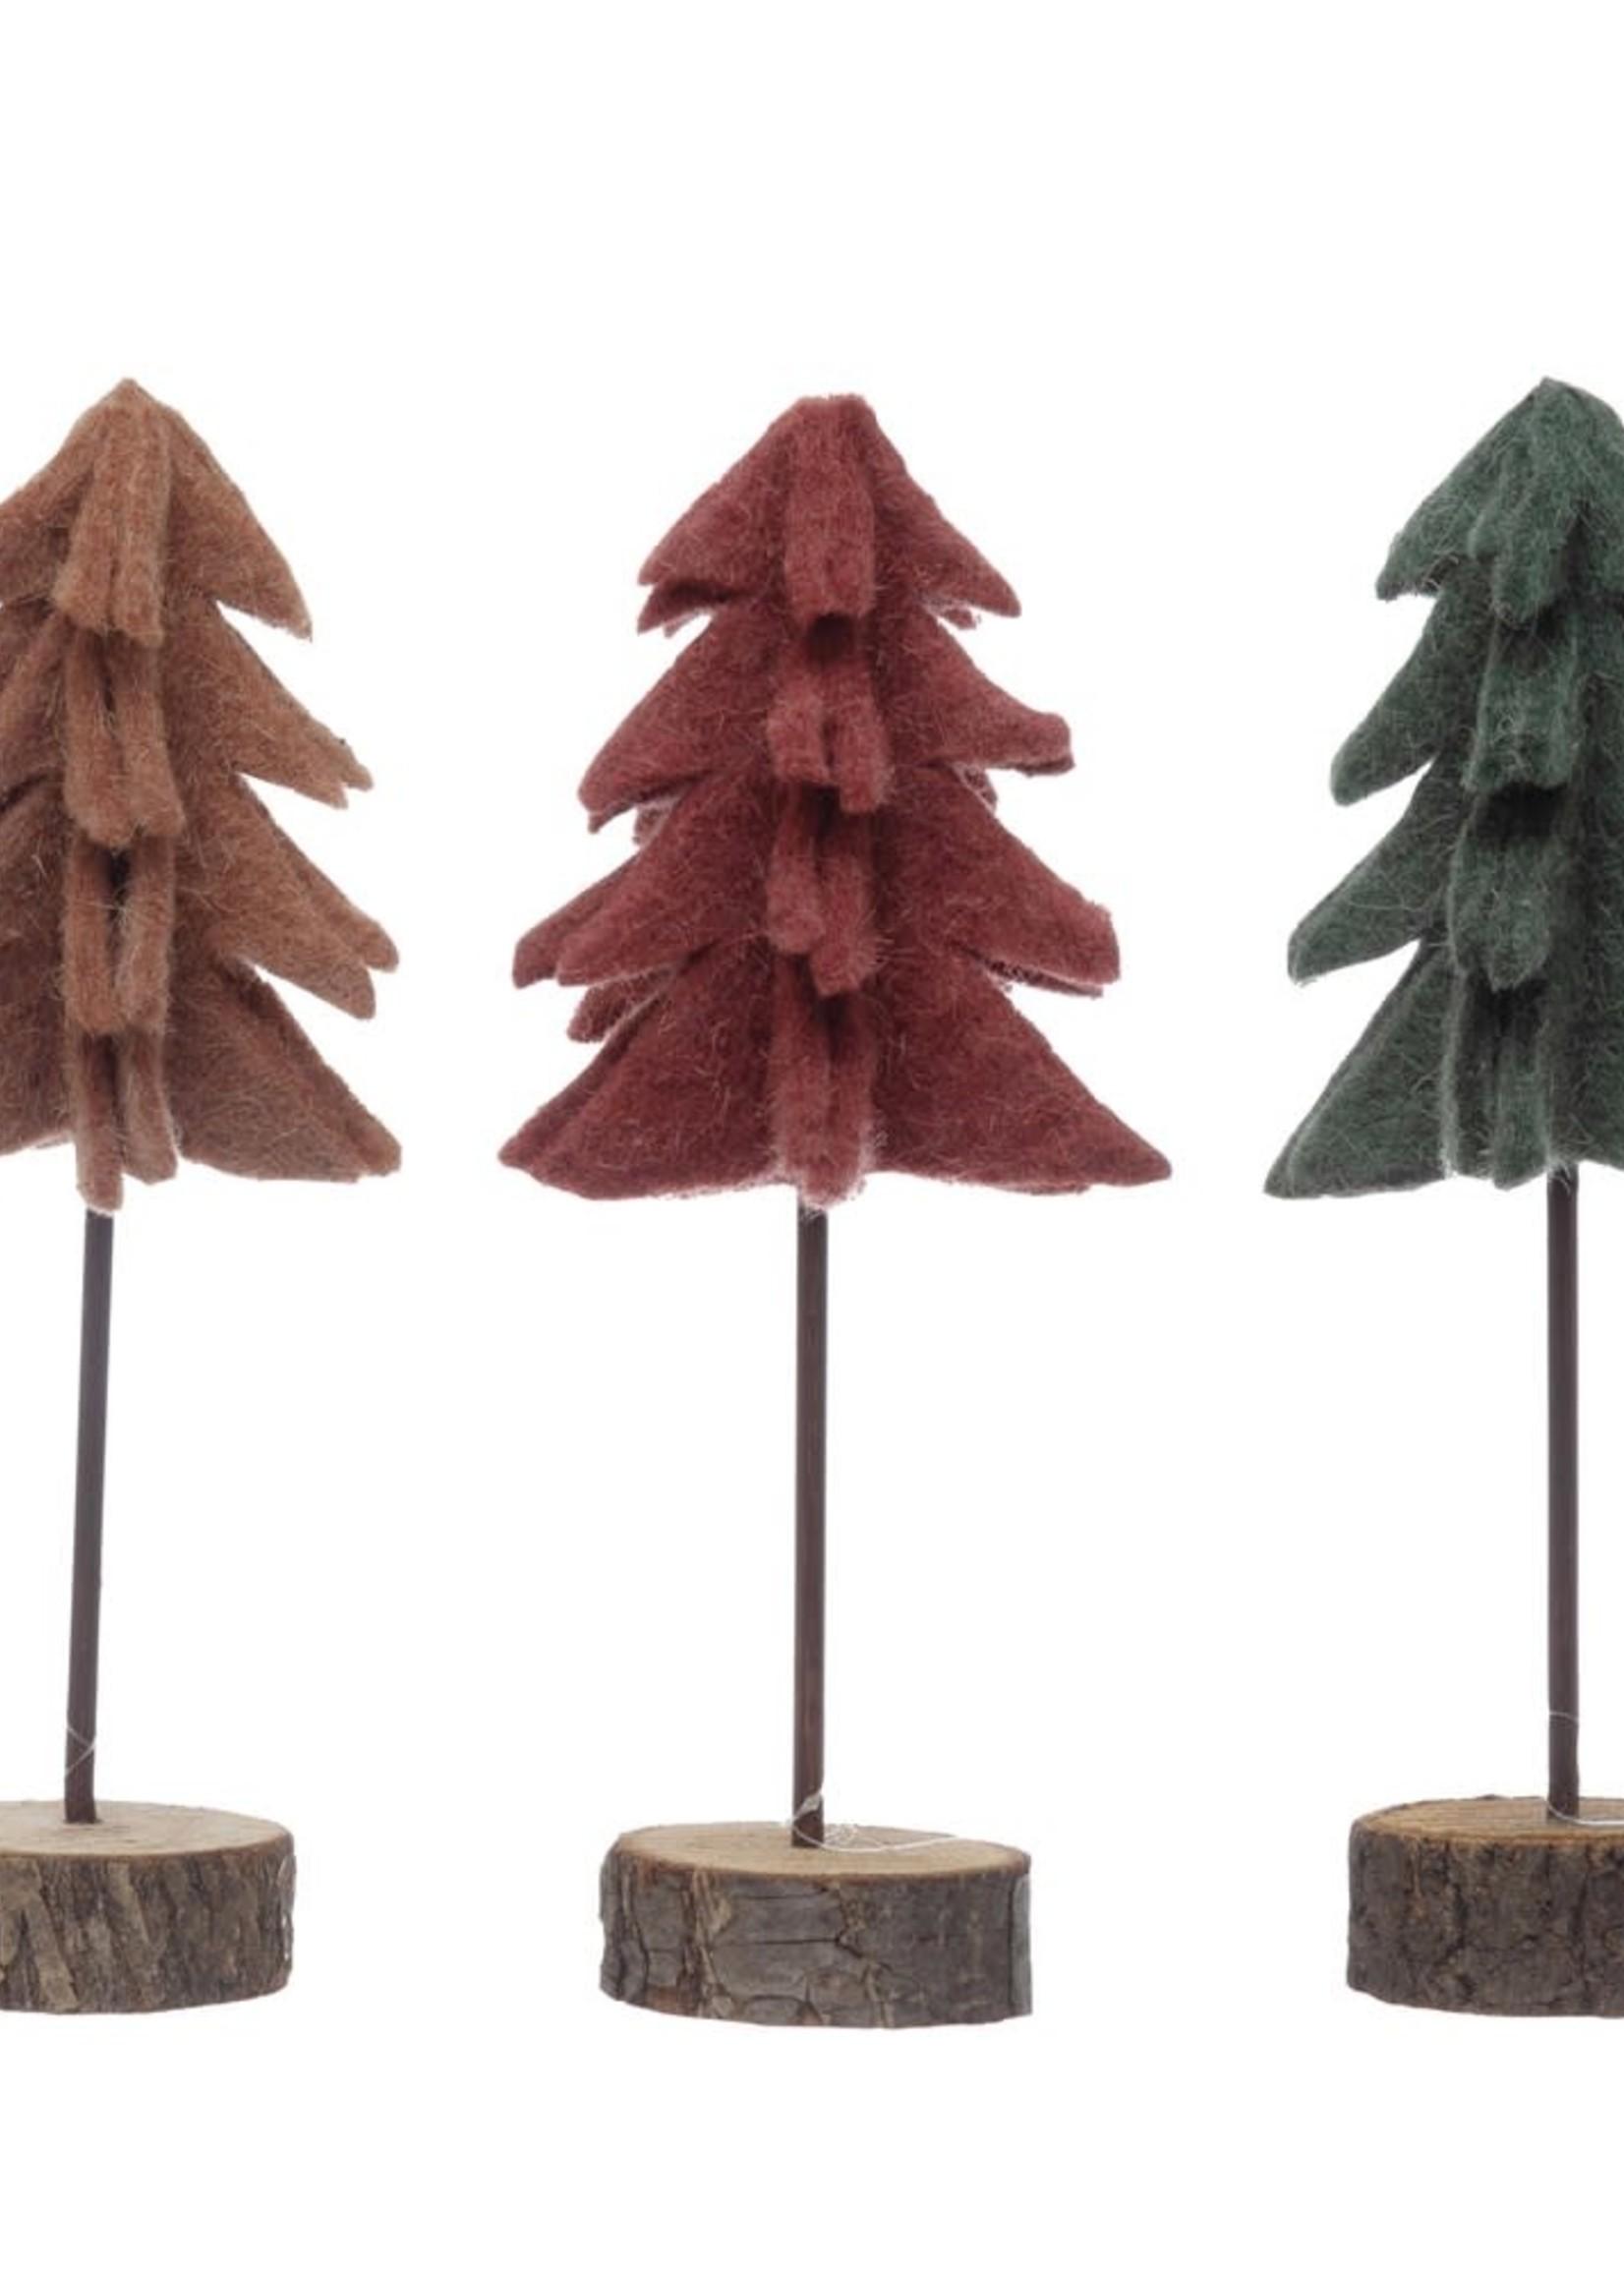 Felt Tree w/ Wood Slice Base, 3 Colors, Md